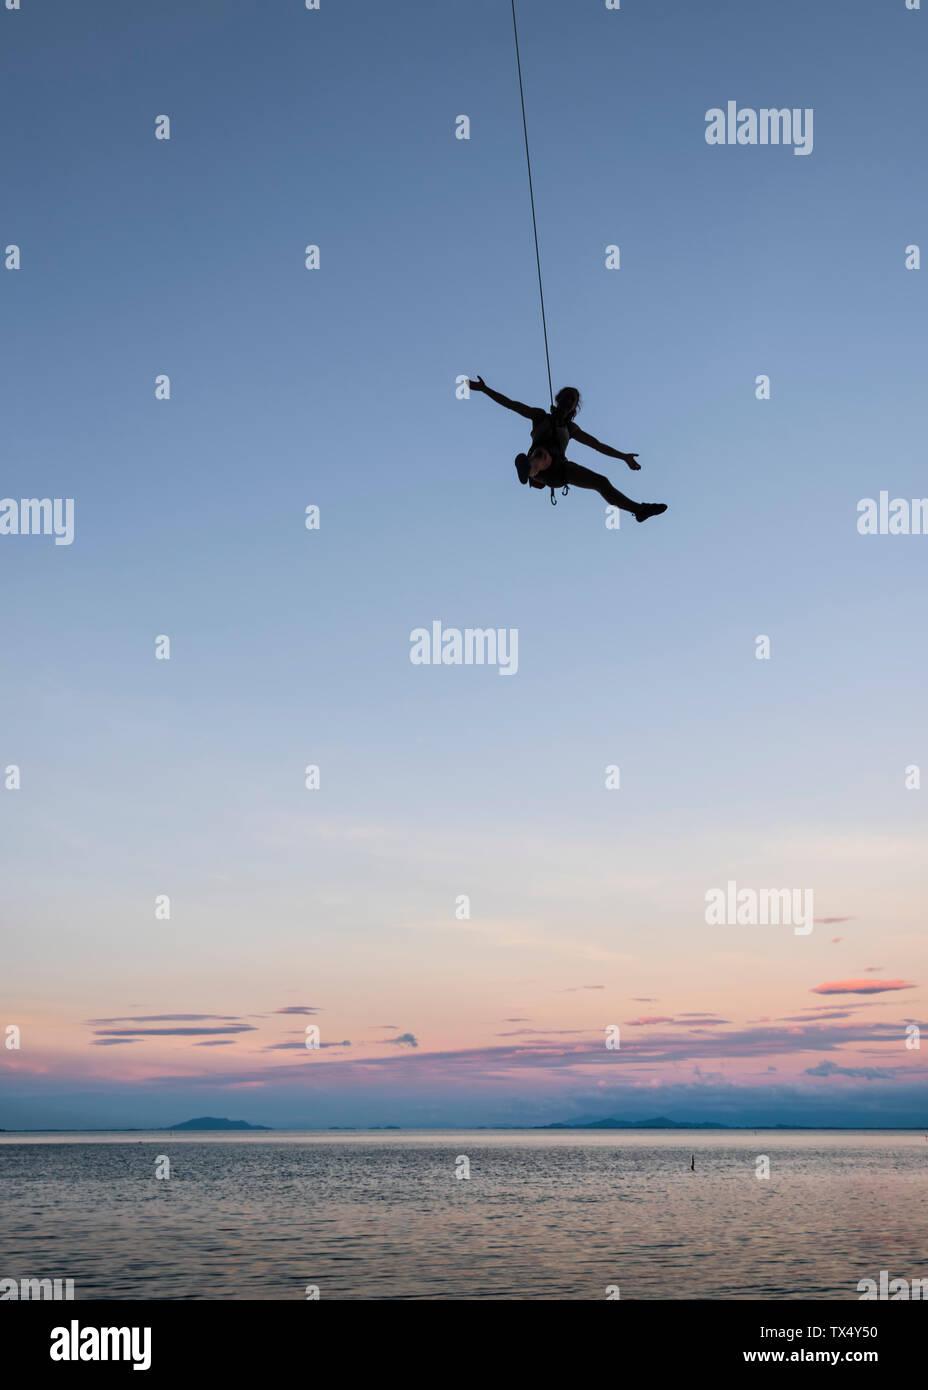 Thailand, Krabi, Lao Liang island, climber abseiling above the sea Stock Photo